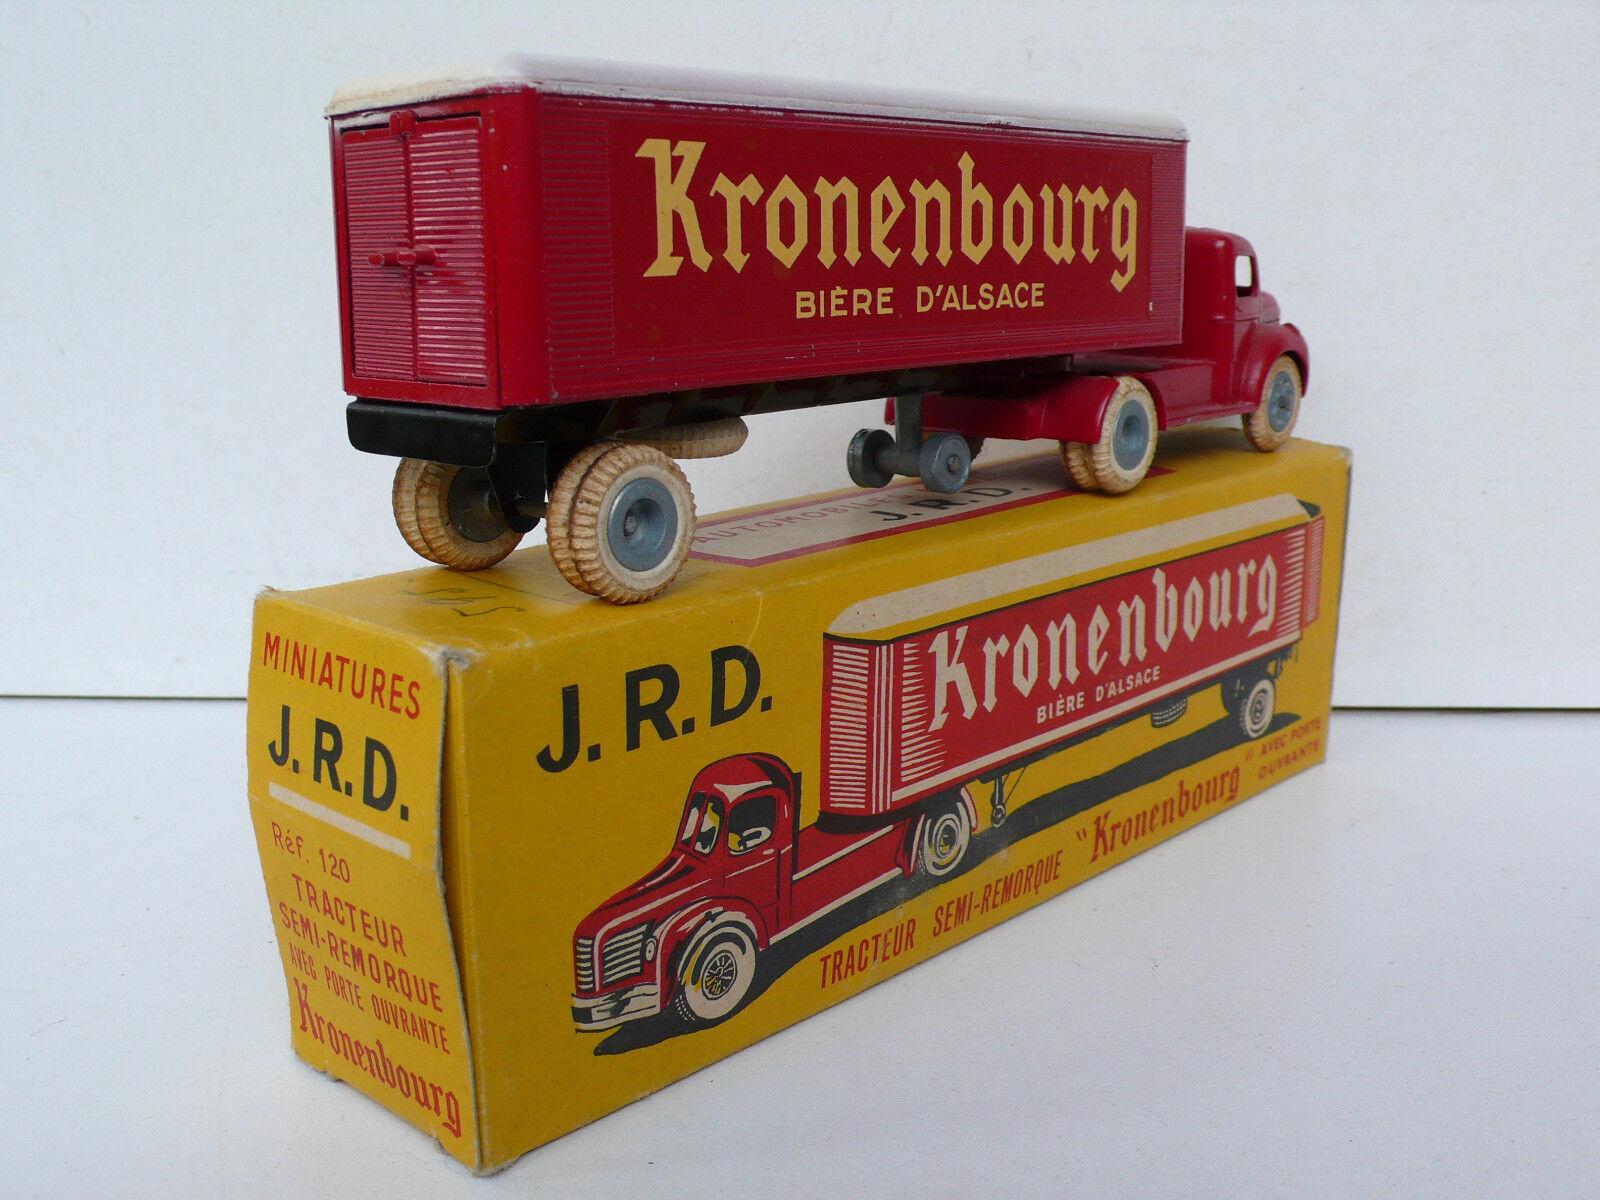 J R D  TRACTEUR TRACTEUR TRACTEUR BERLIET SEMIREMORQUE   KRONENBOURG  BOITE D'ORIGINE BEL ÉTAT   Outlet  425770